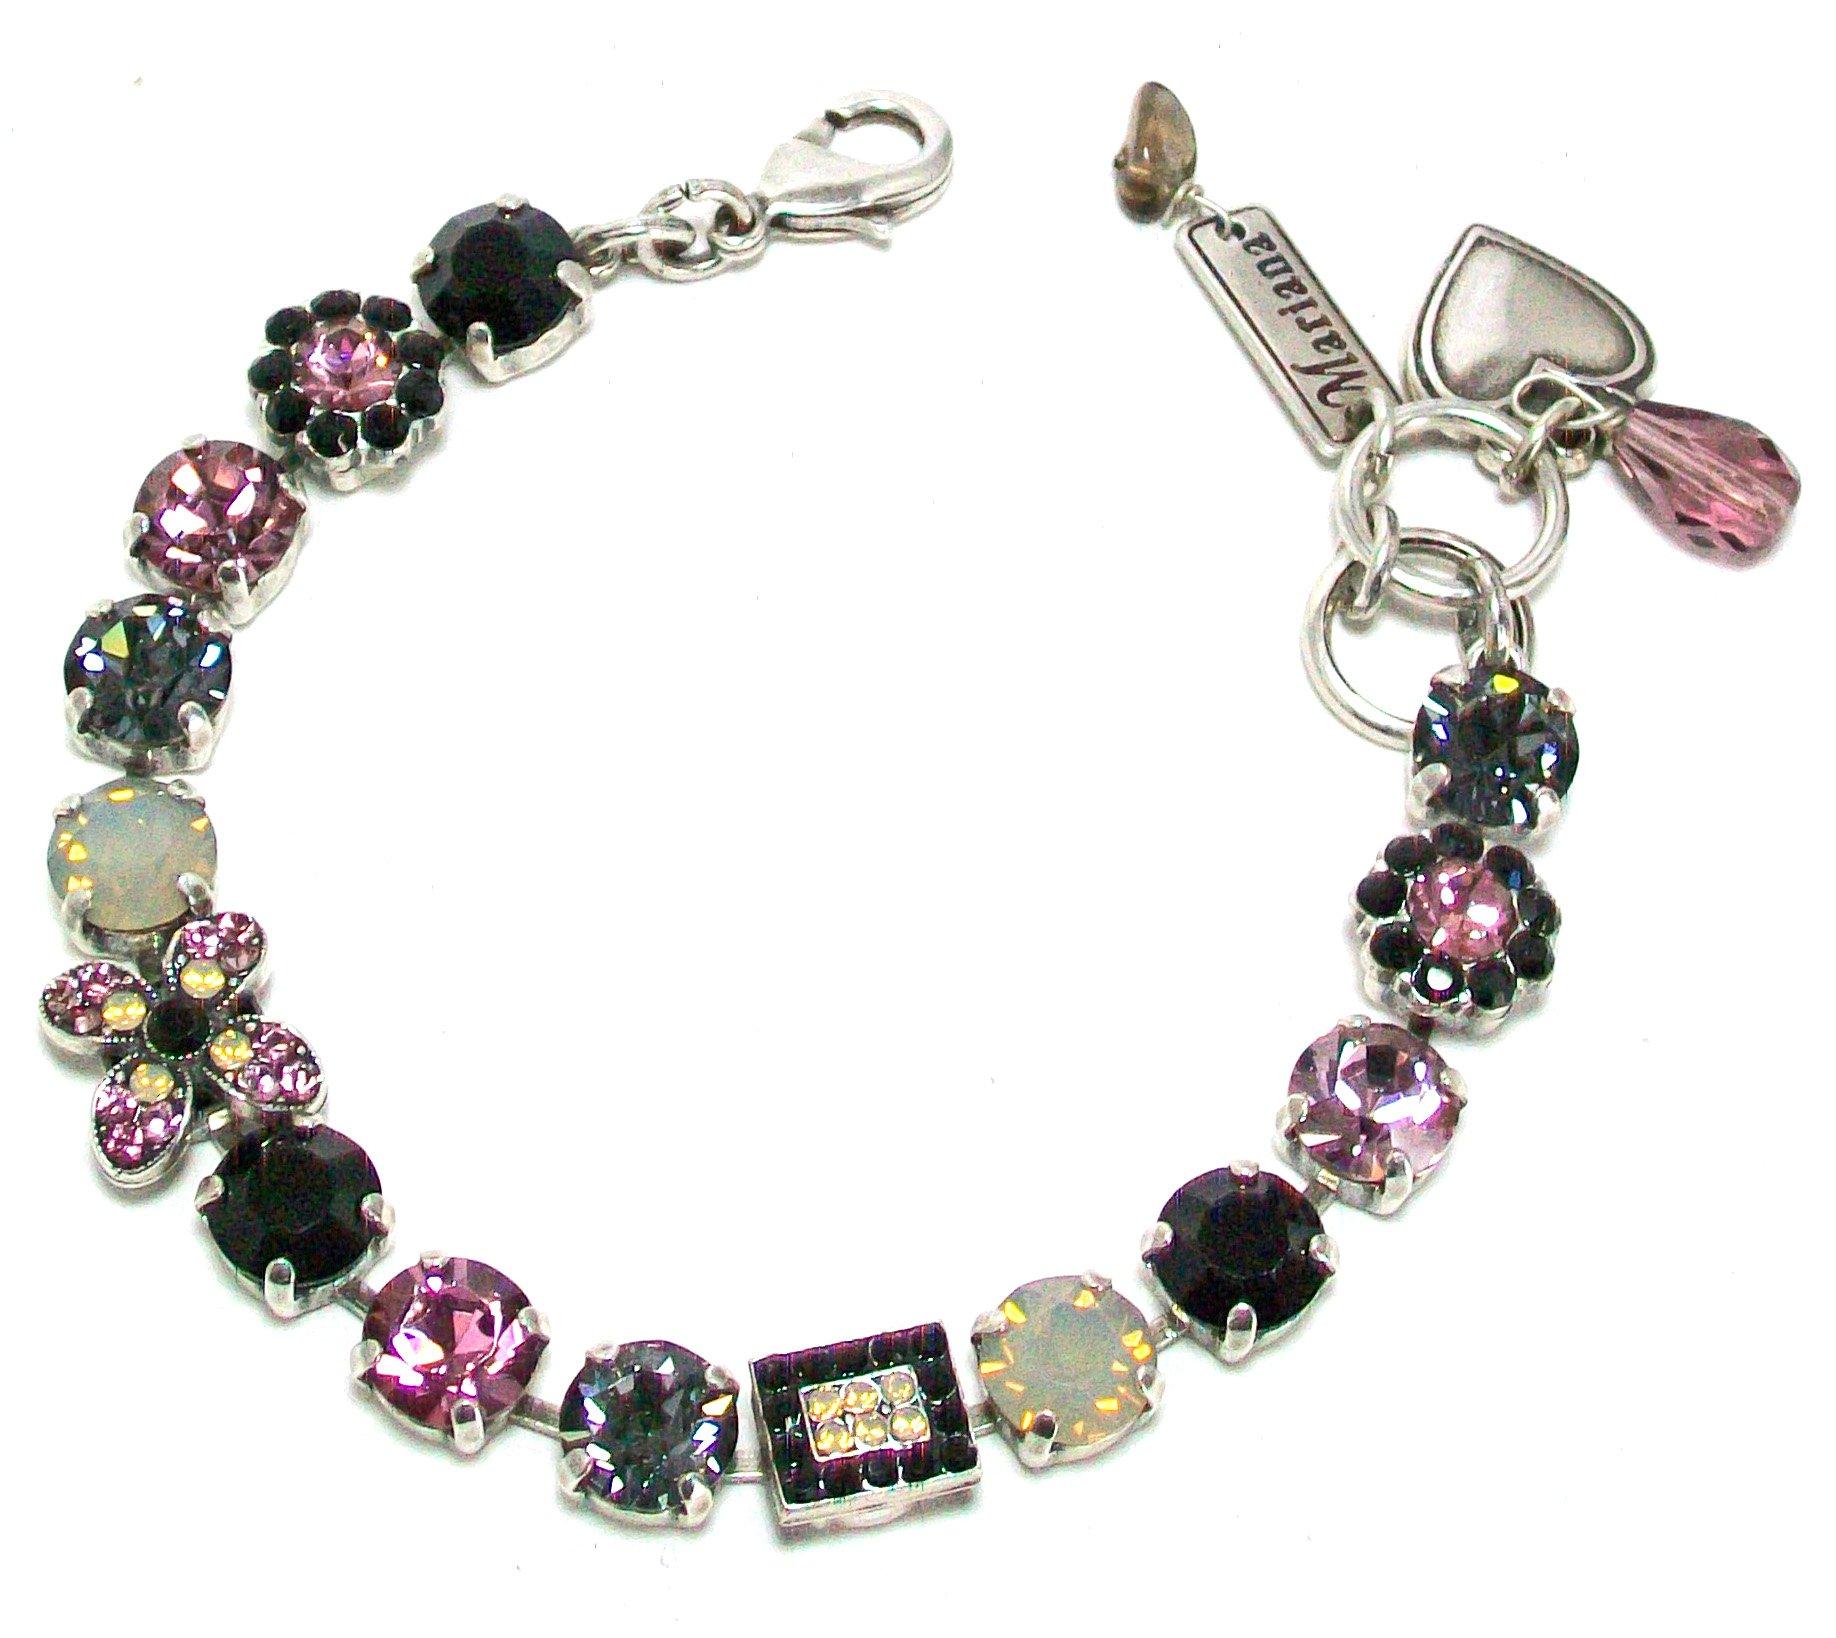 Mariana ''Romance'' Antique Silver Plated Swarovski Crystal Tennis Bracelet, 7.5''